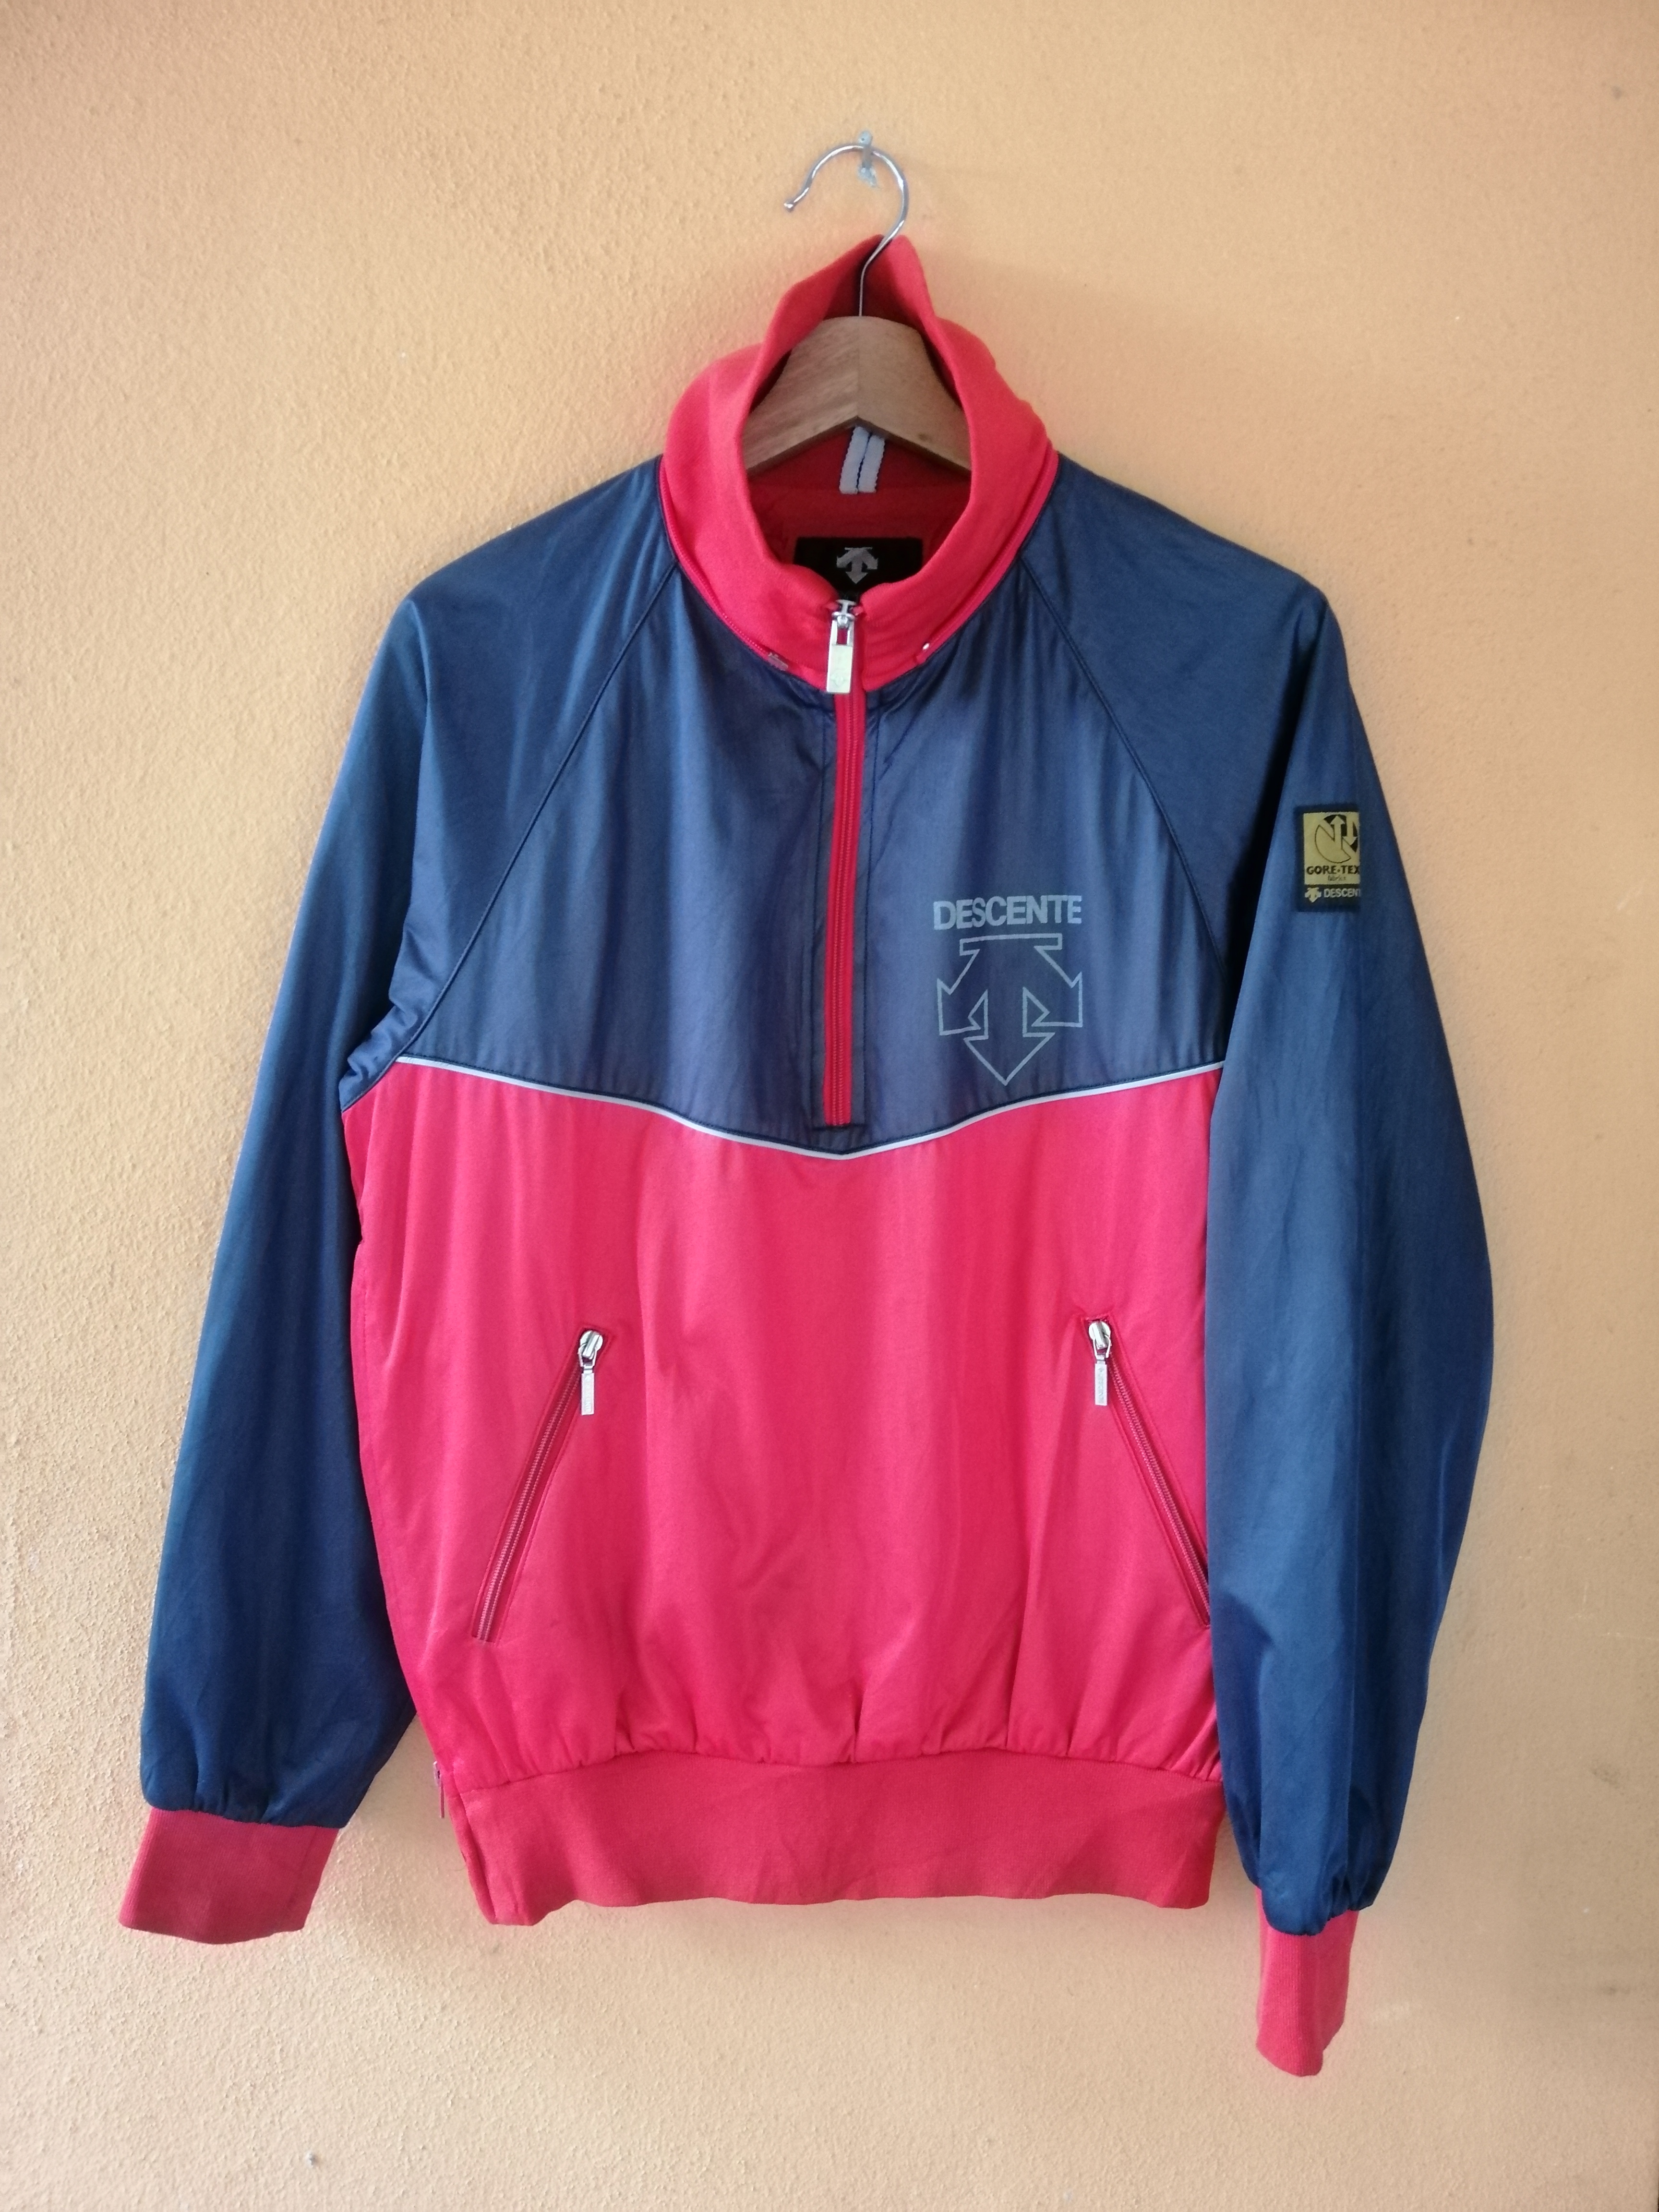 Descente Gore-Tex Windbreaker Medium Vintage 90s Ncaa Descente Gore Tex Streetwear Light Zipper Jacket Size M